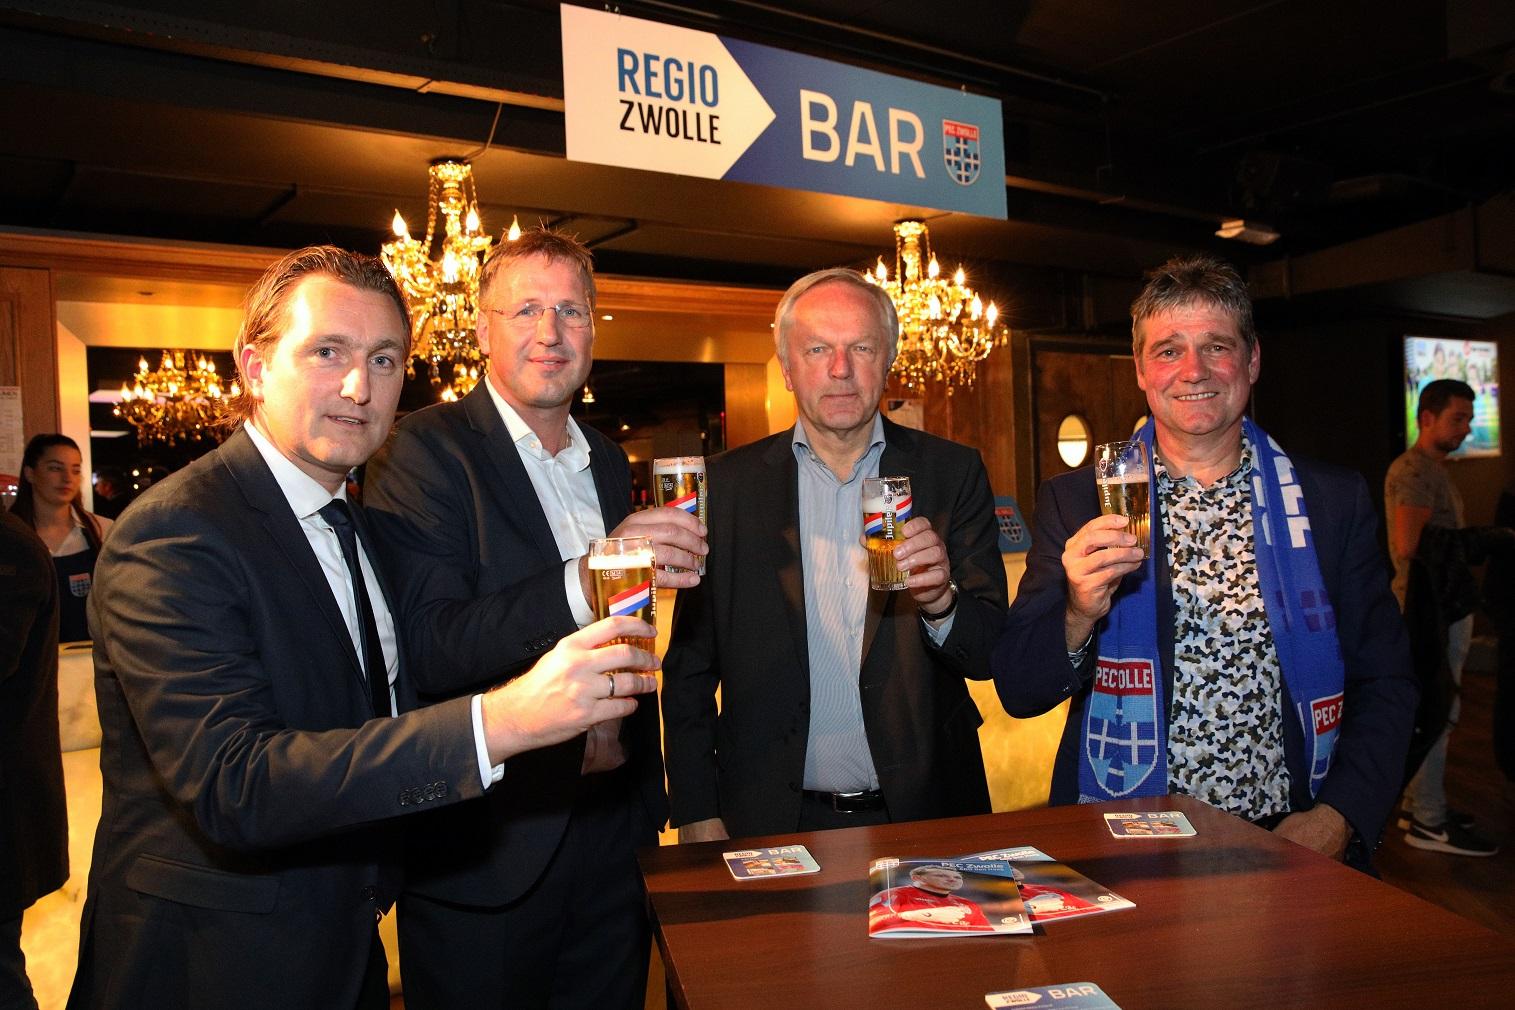 opening Regio Zwolle Bar